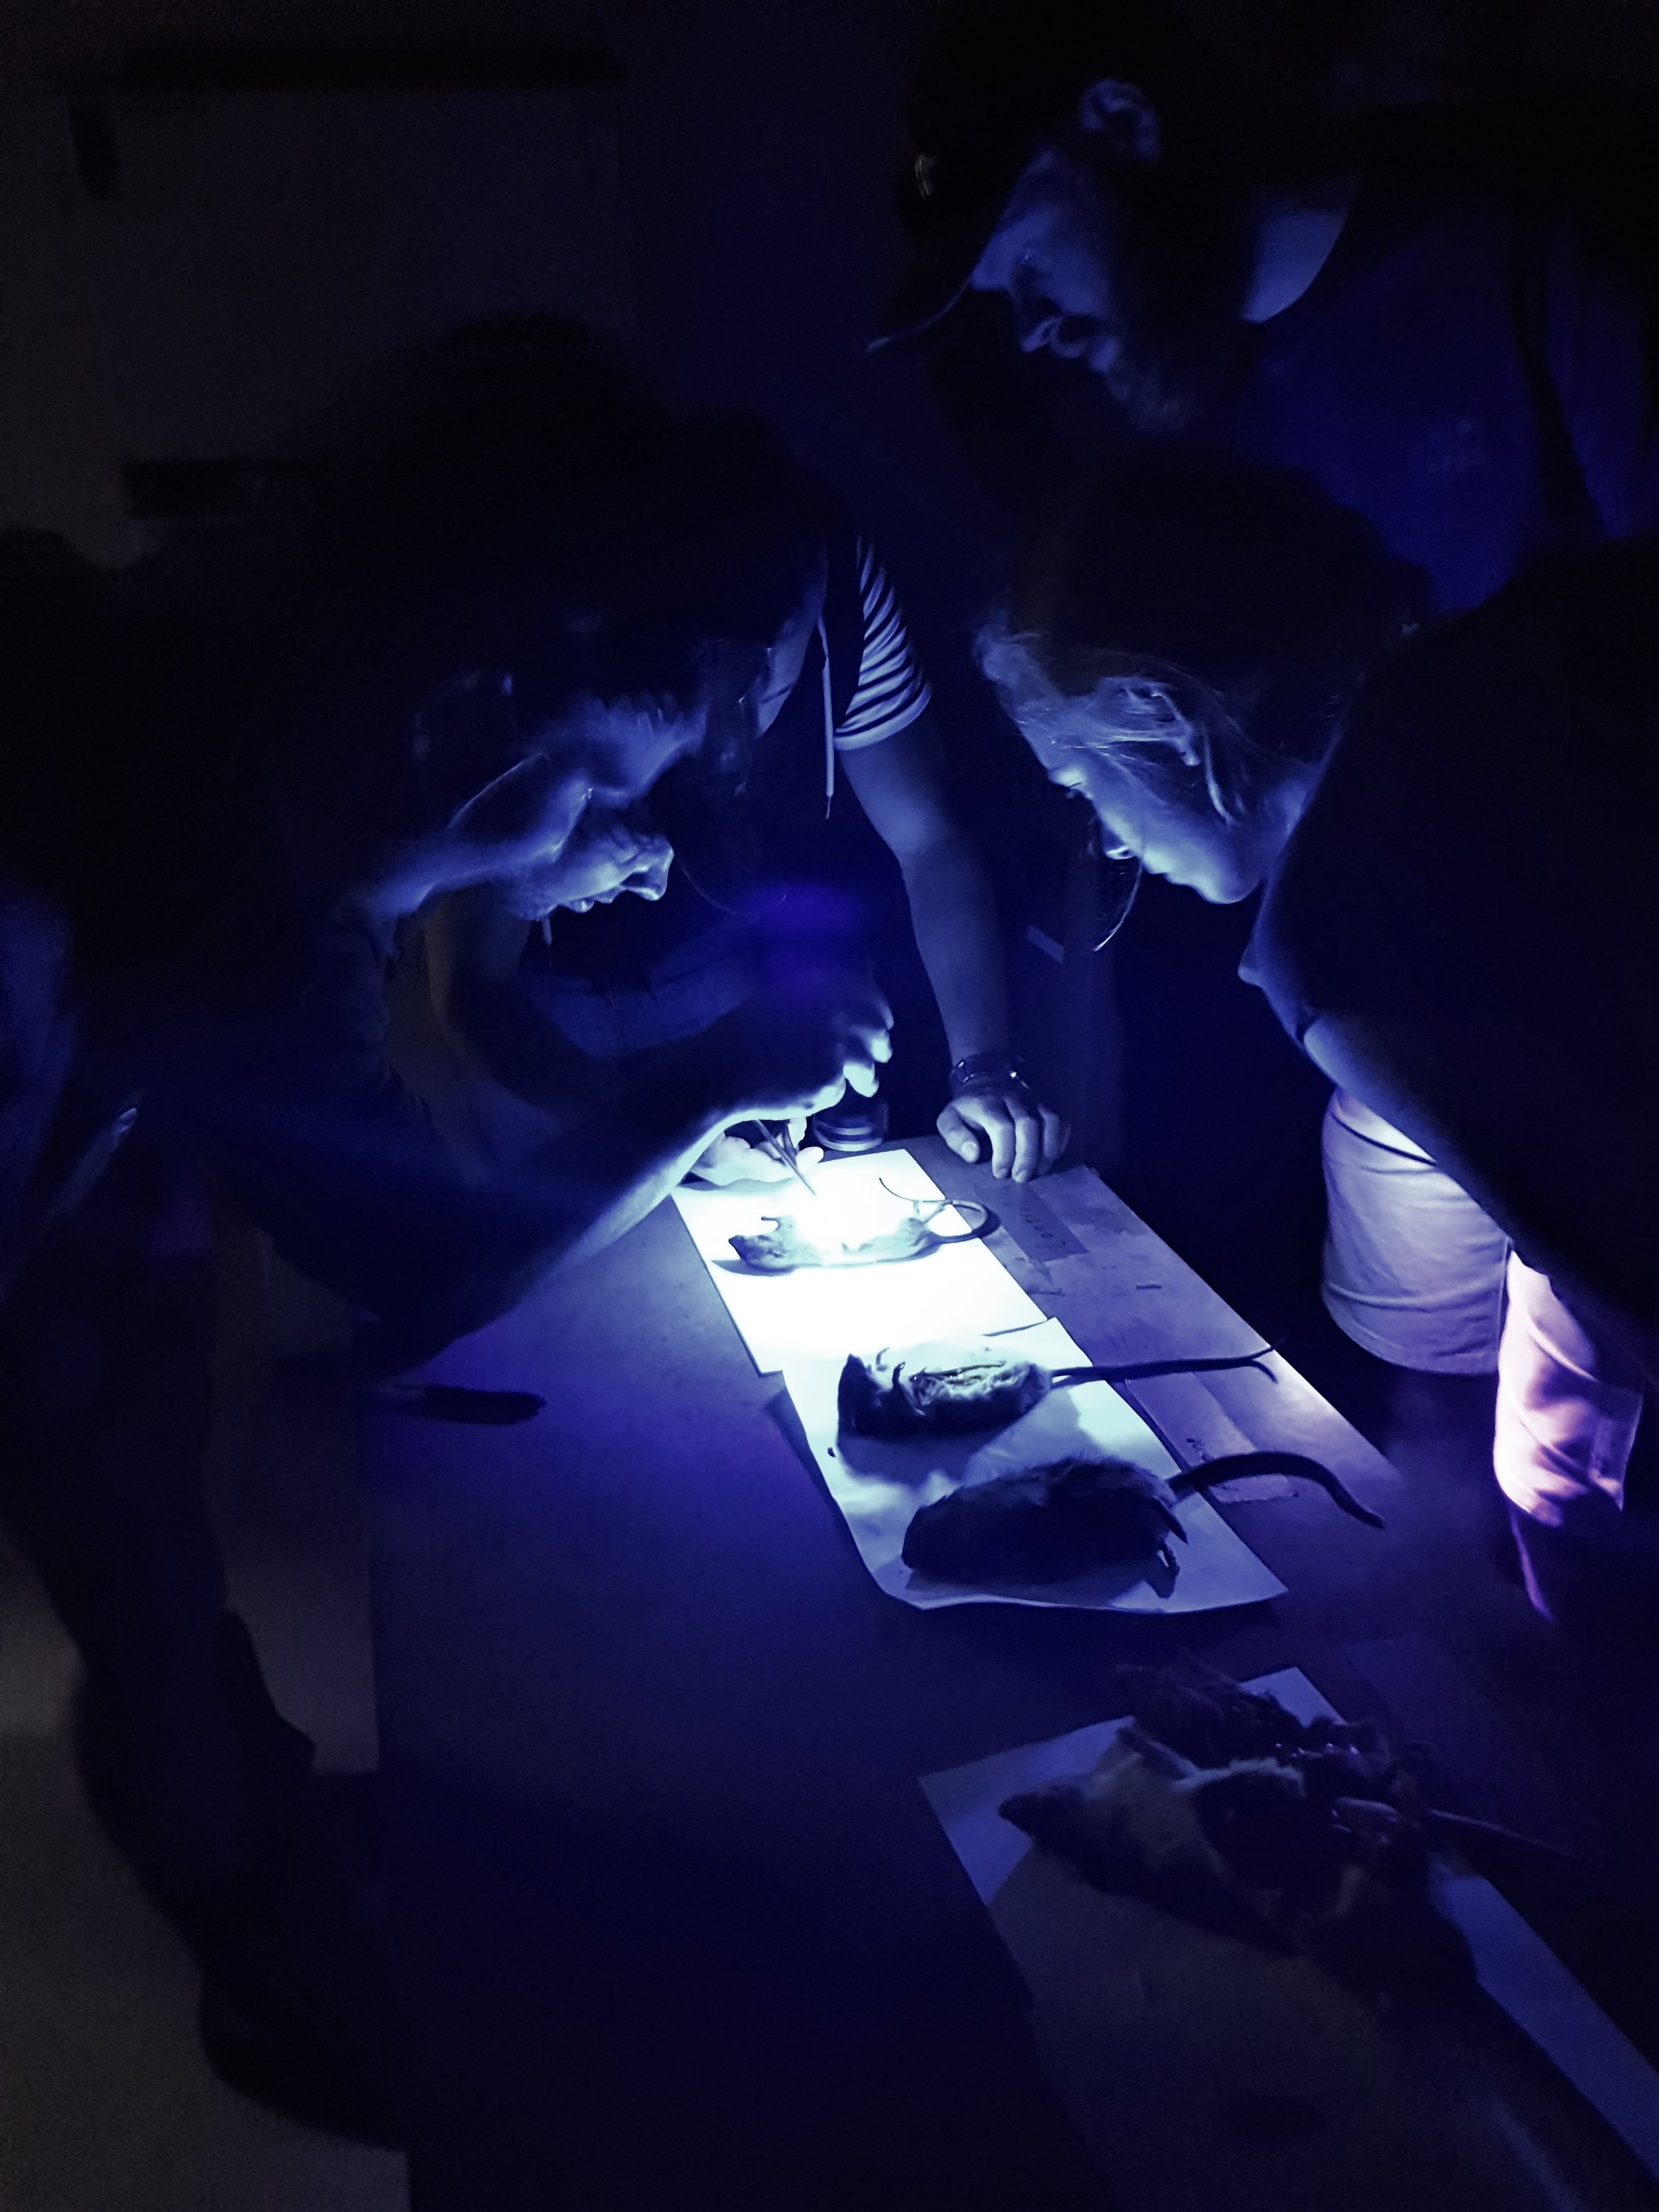 The Perth River valley field team examine rat carcasses for rhodamine B under ultraviolet light